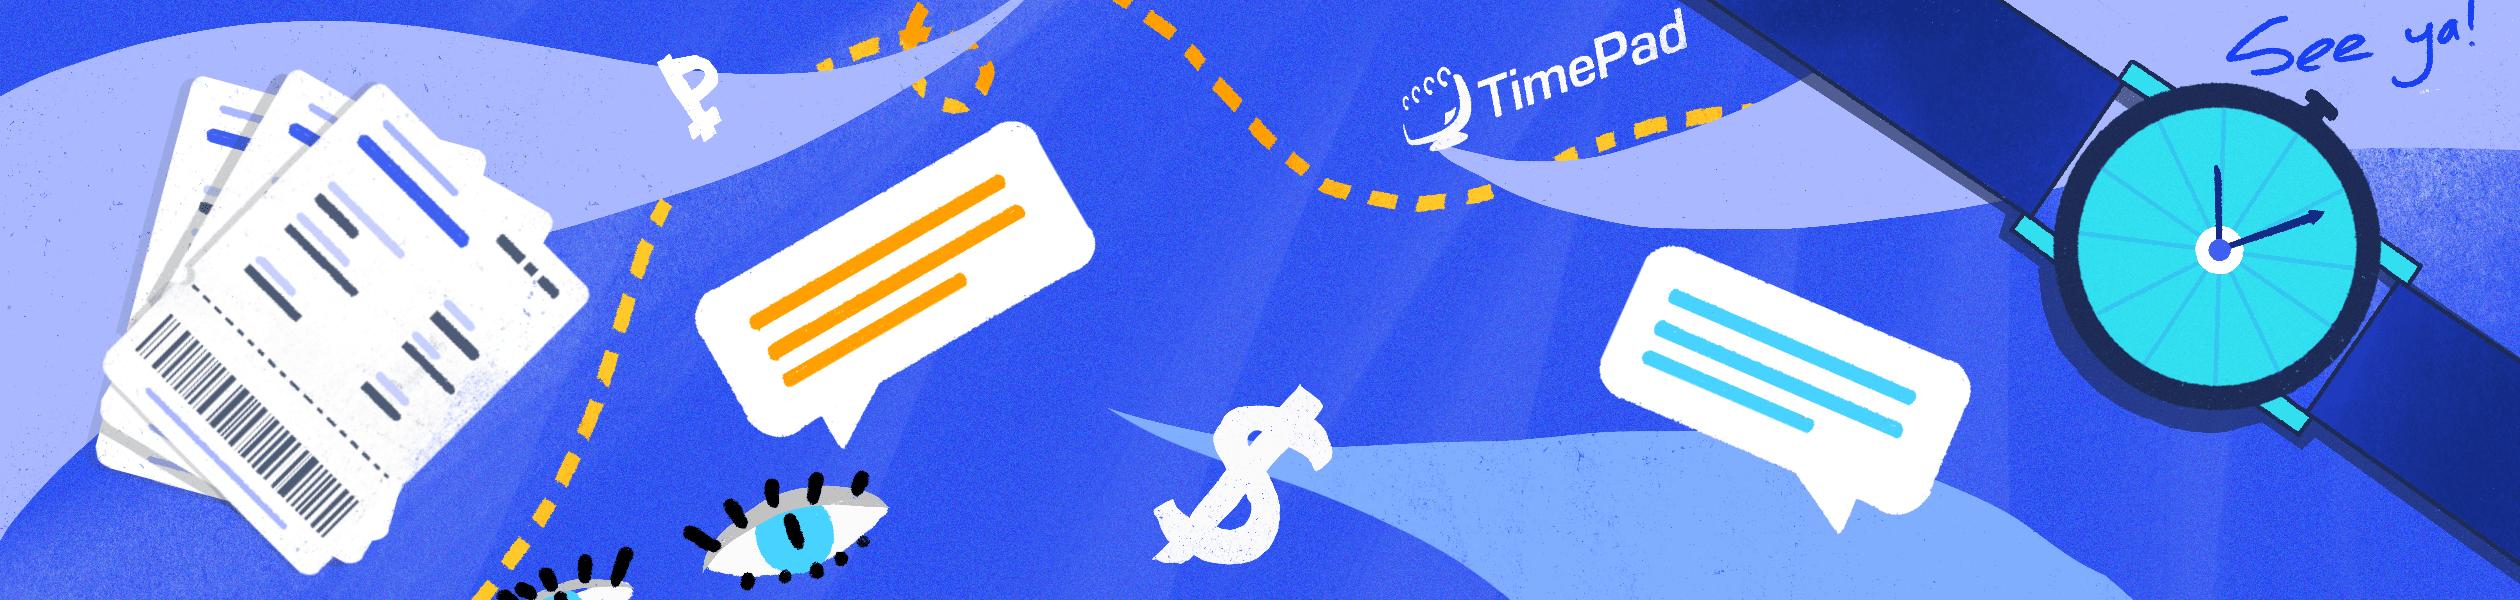 кейс контент-маркетинг для TimePad